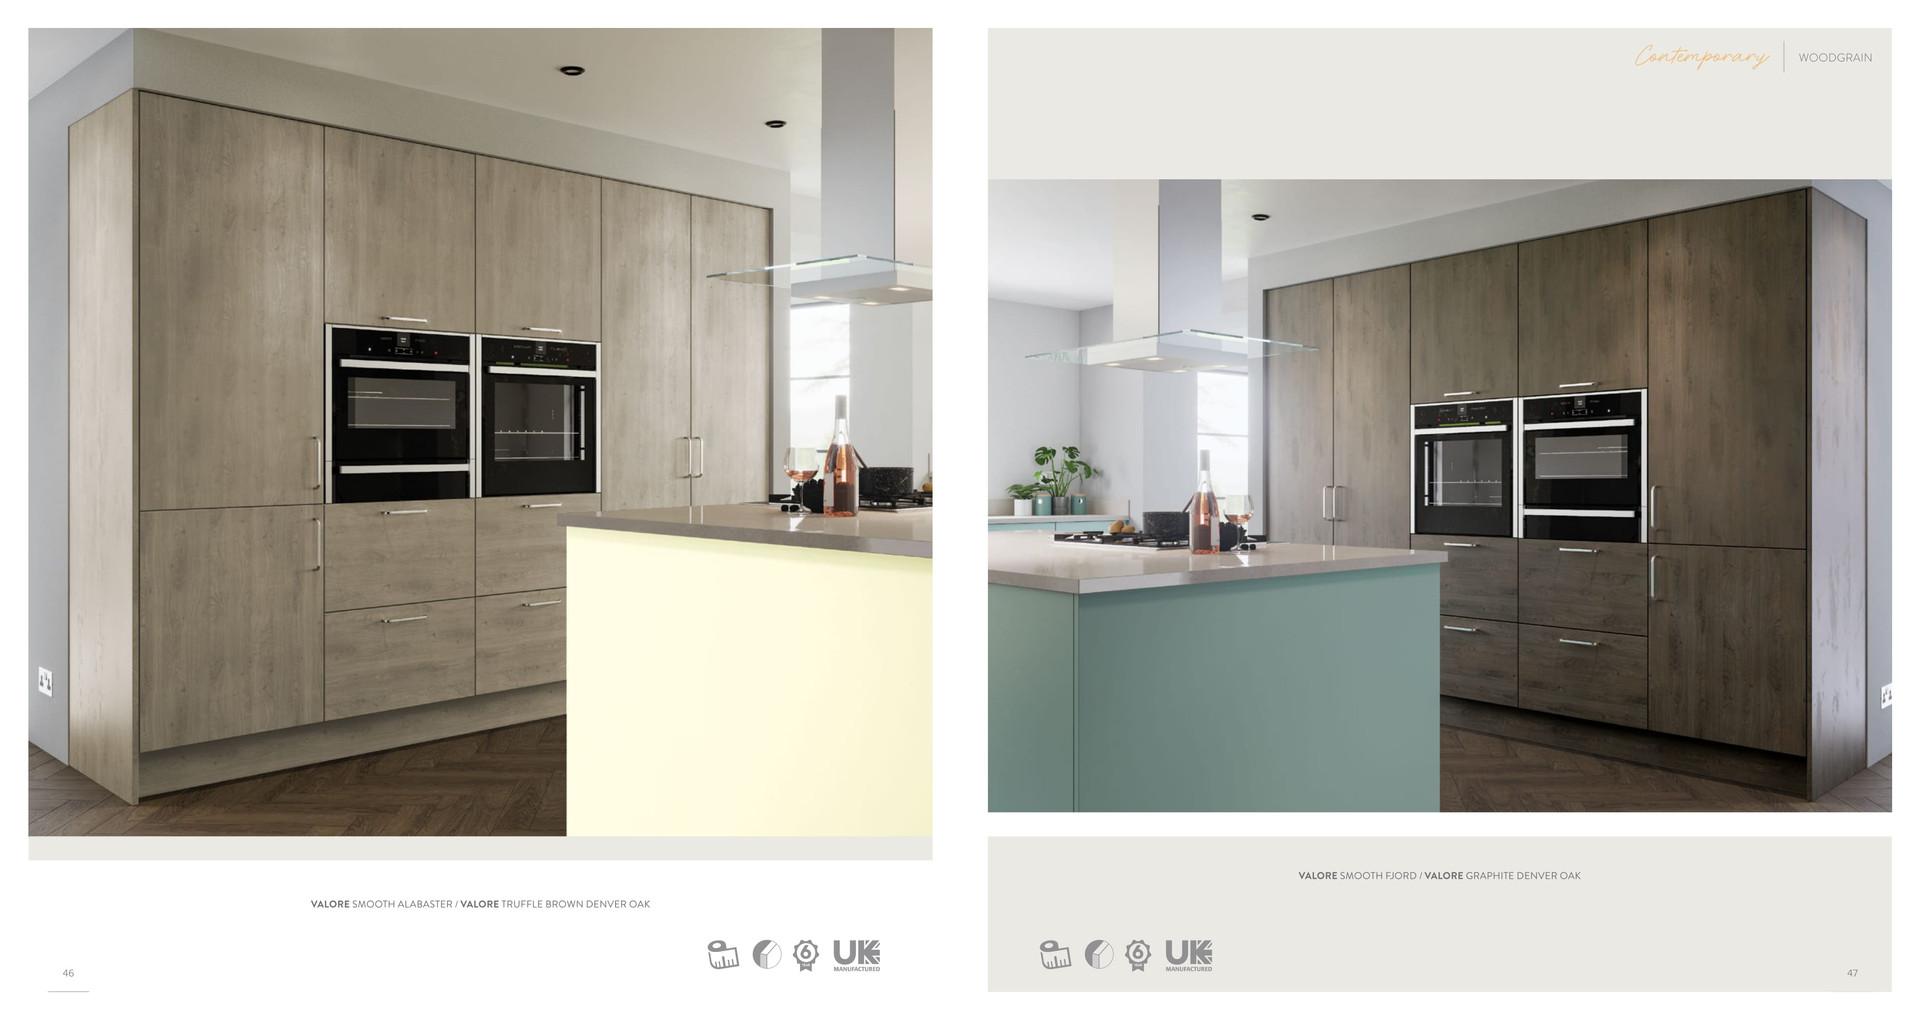 blossom-avenue-kitchen-brochure-2020-24.